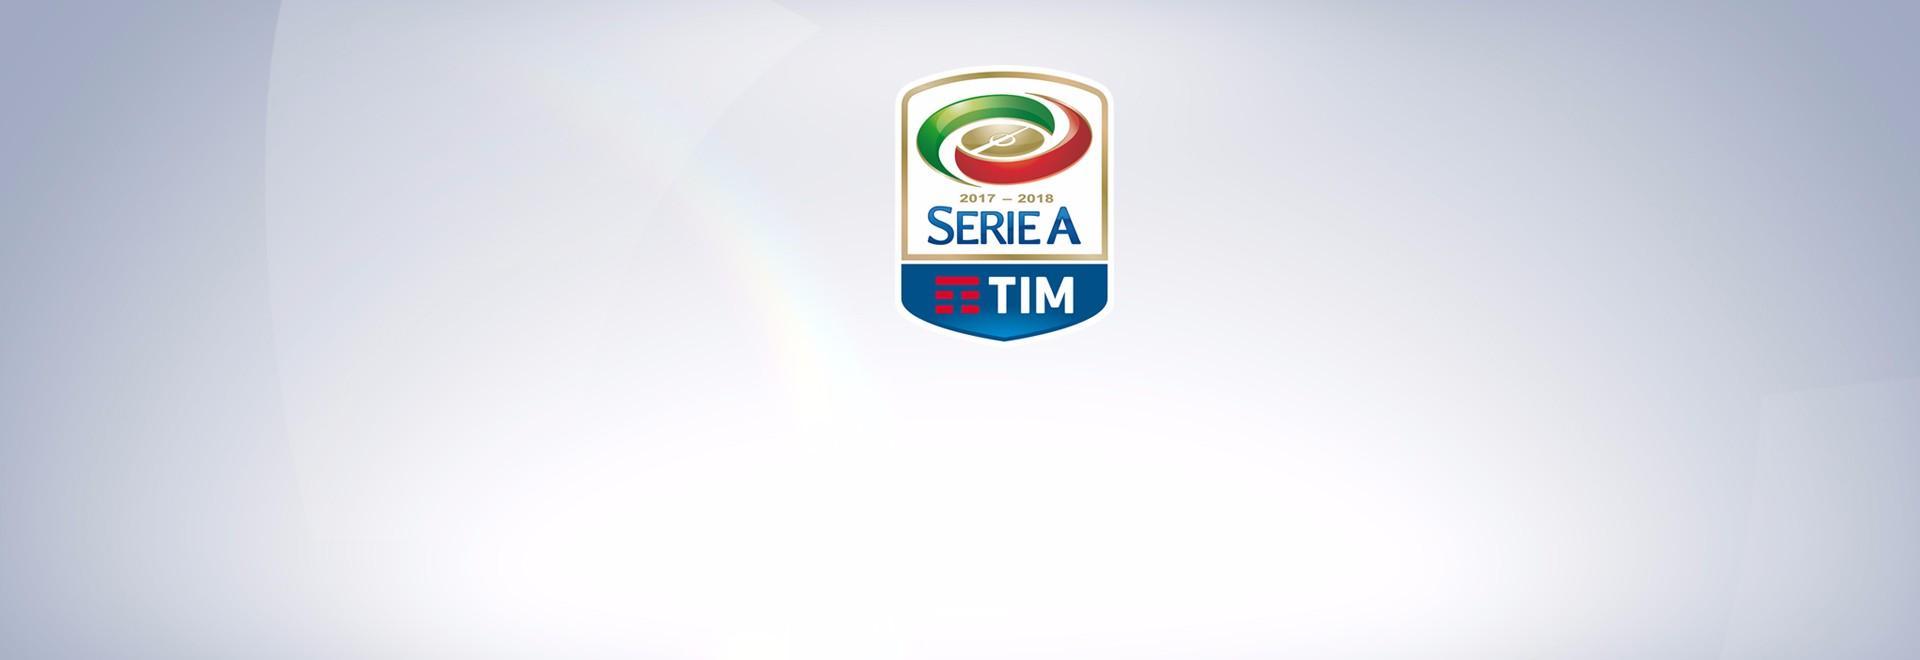 Torino - Fiorentina